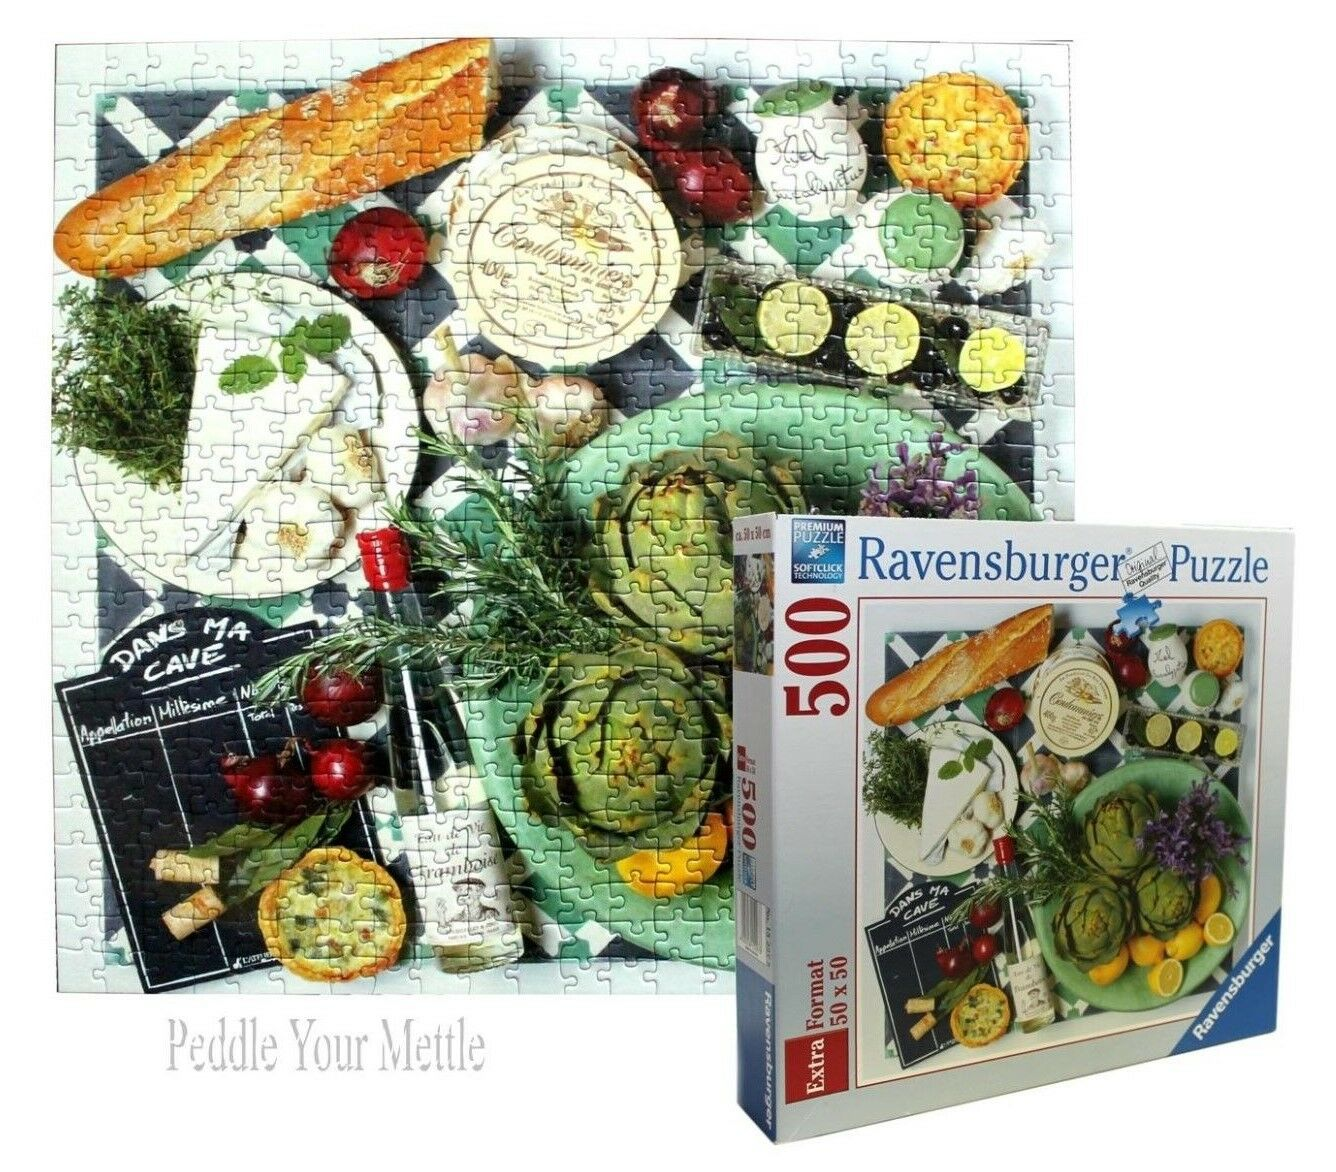 Ravensburger Picnic 500 Piece Jigsaw Puzzle 100% COMPLETE - RARE